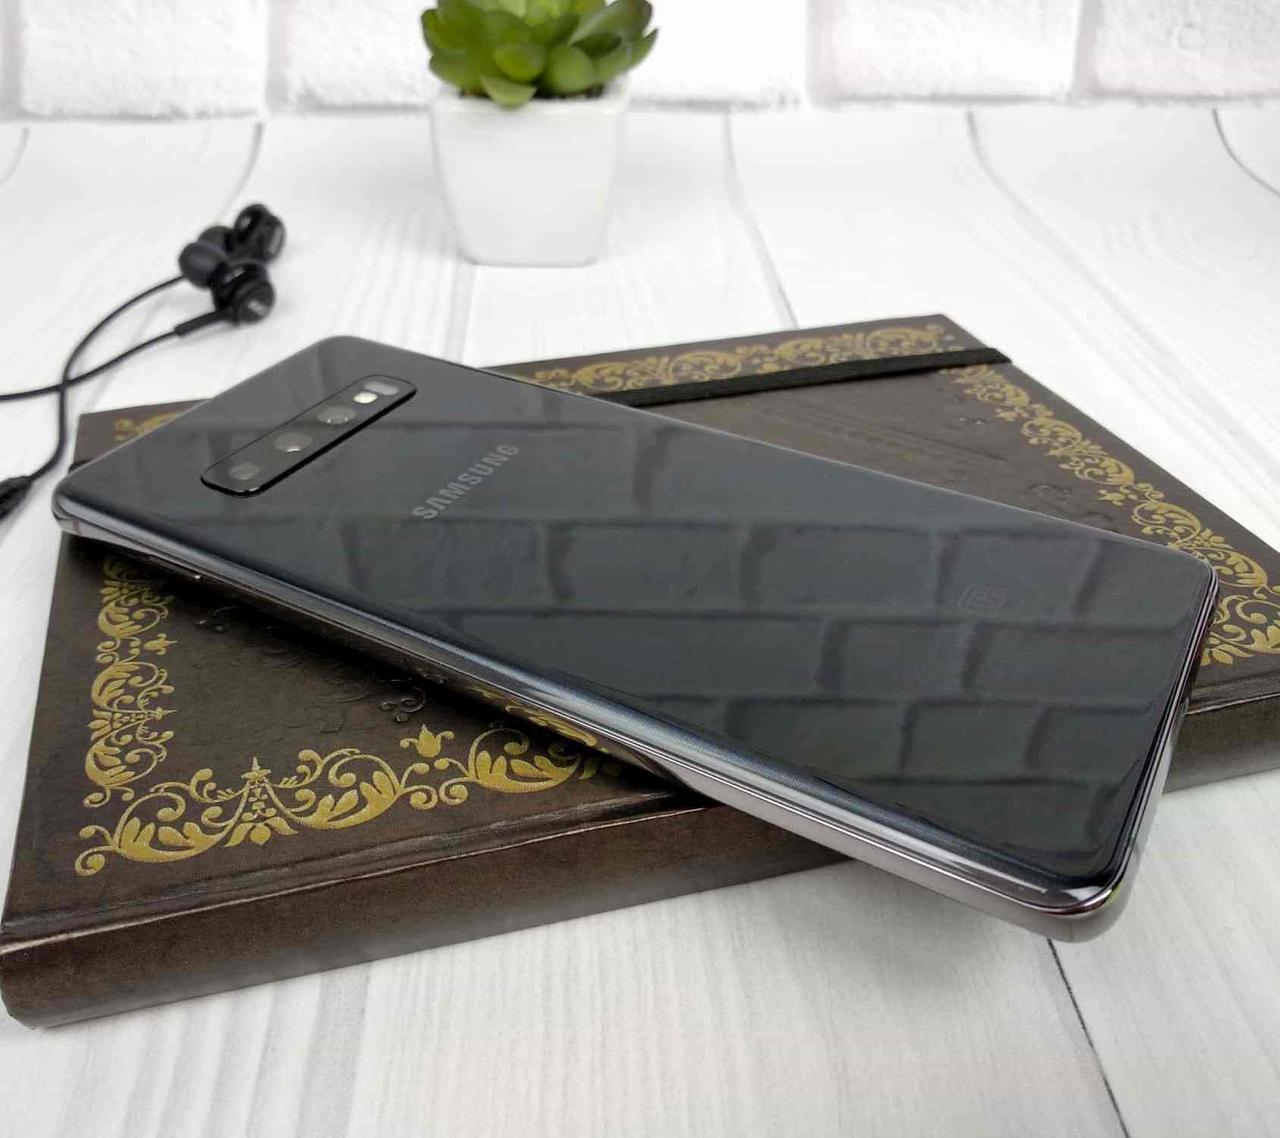 "Samsung Galaxy S10 Plus (Самсунг с10+) 6.4"" 128Gb. 12-Ядер. 4G. Реплика Корея"